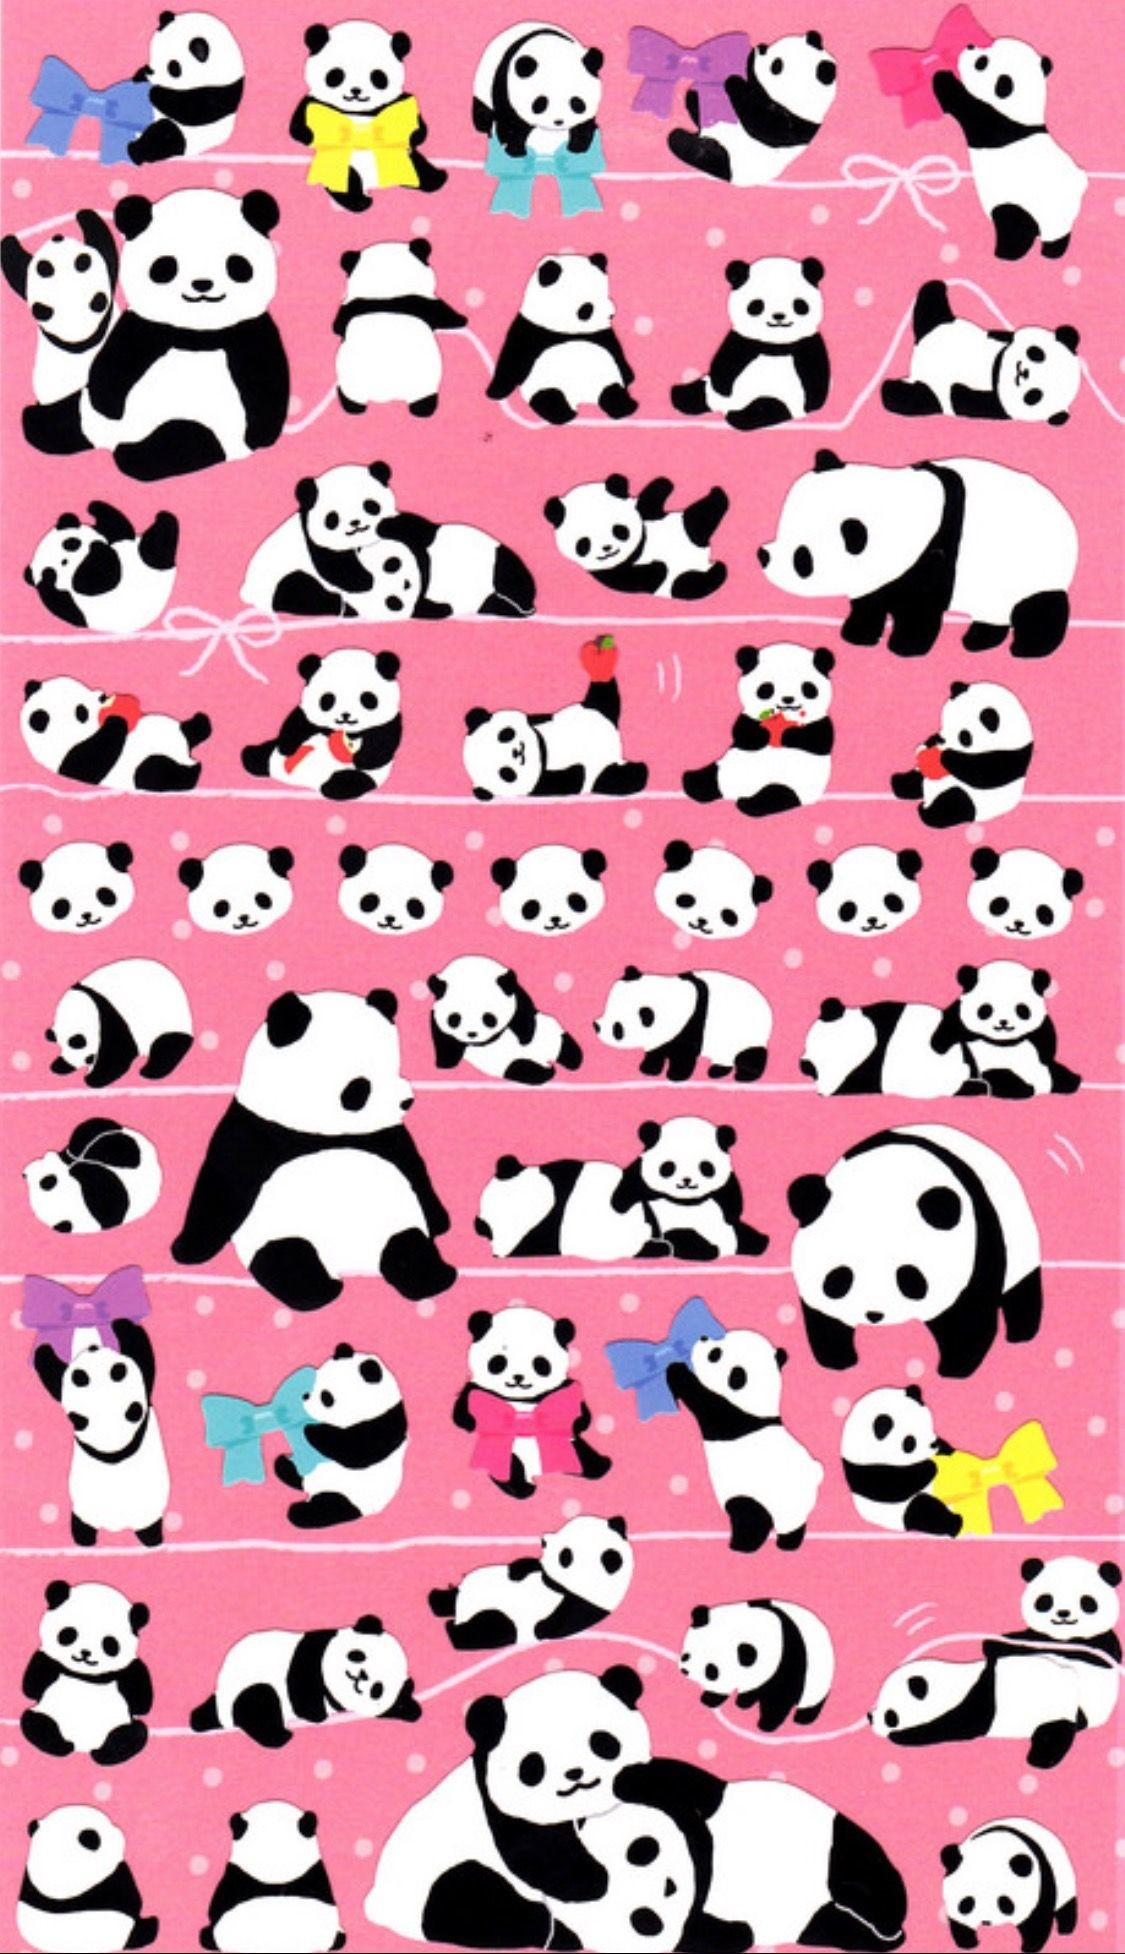 Pink Panda Wallpaper (66+ images)